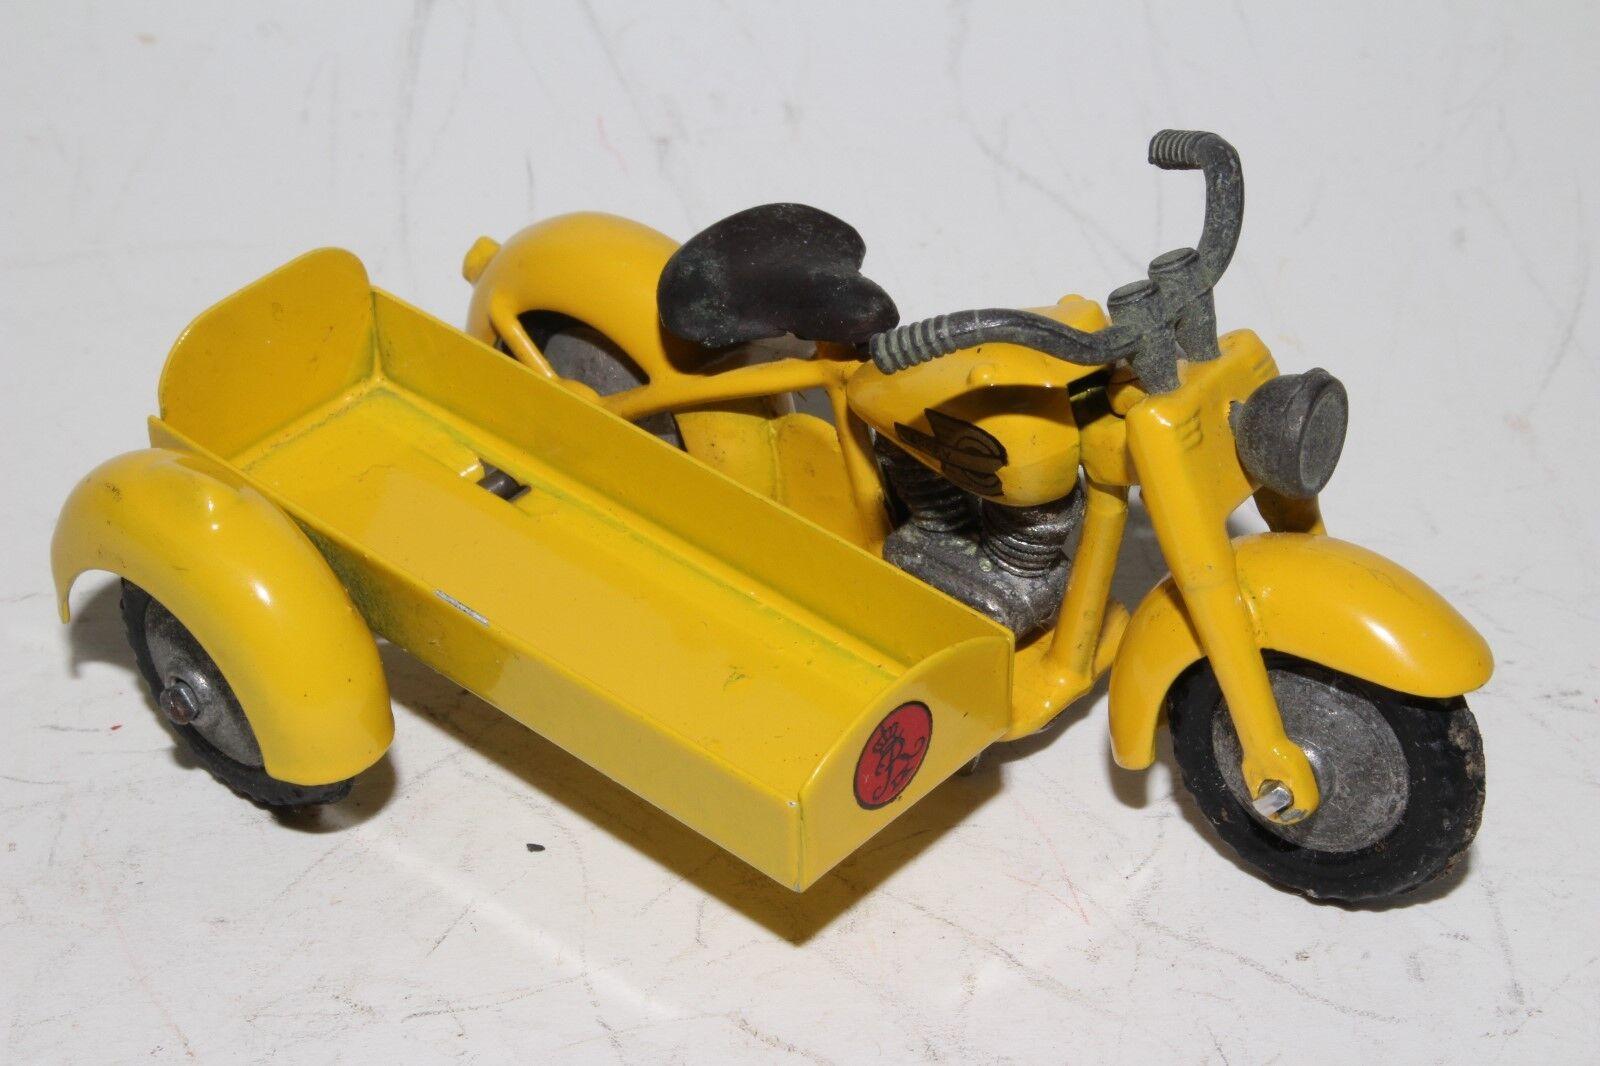 1950's Tekno Harley Davidson Motorcycle with Sidecar, Nice Original